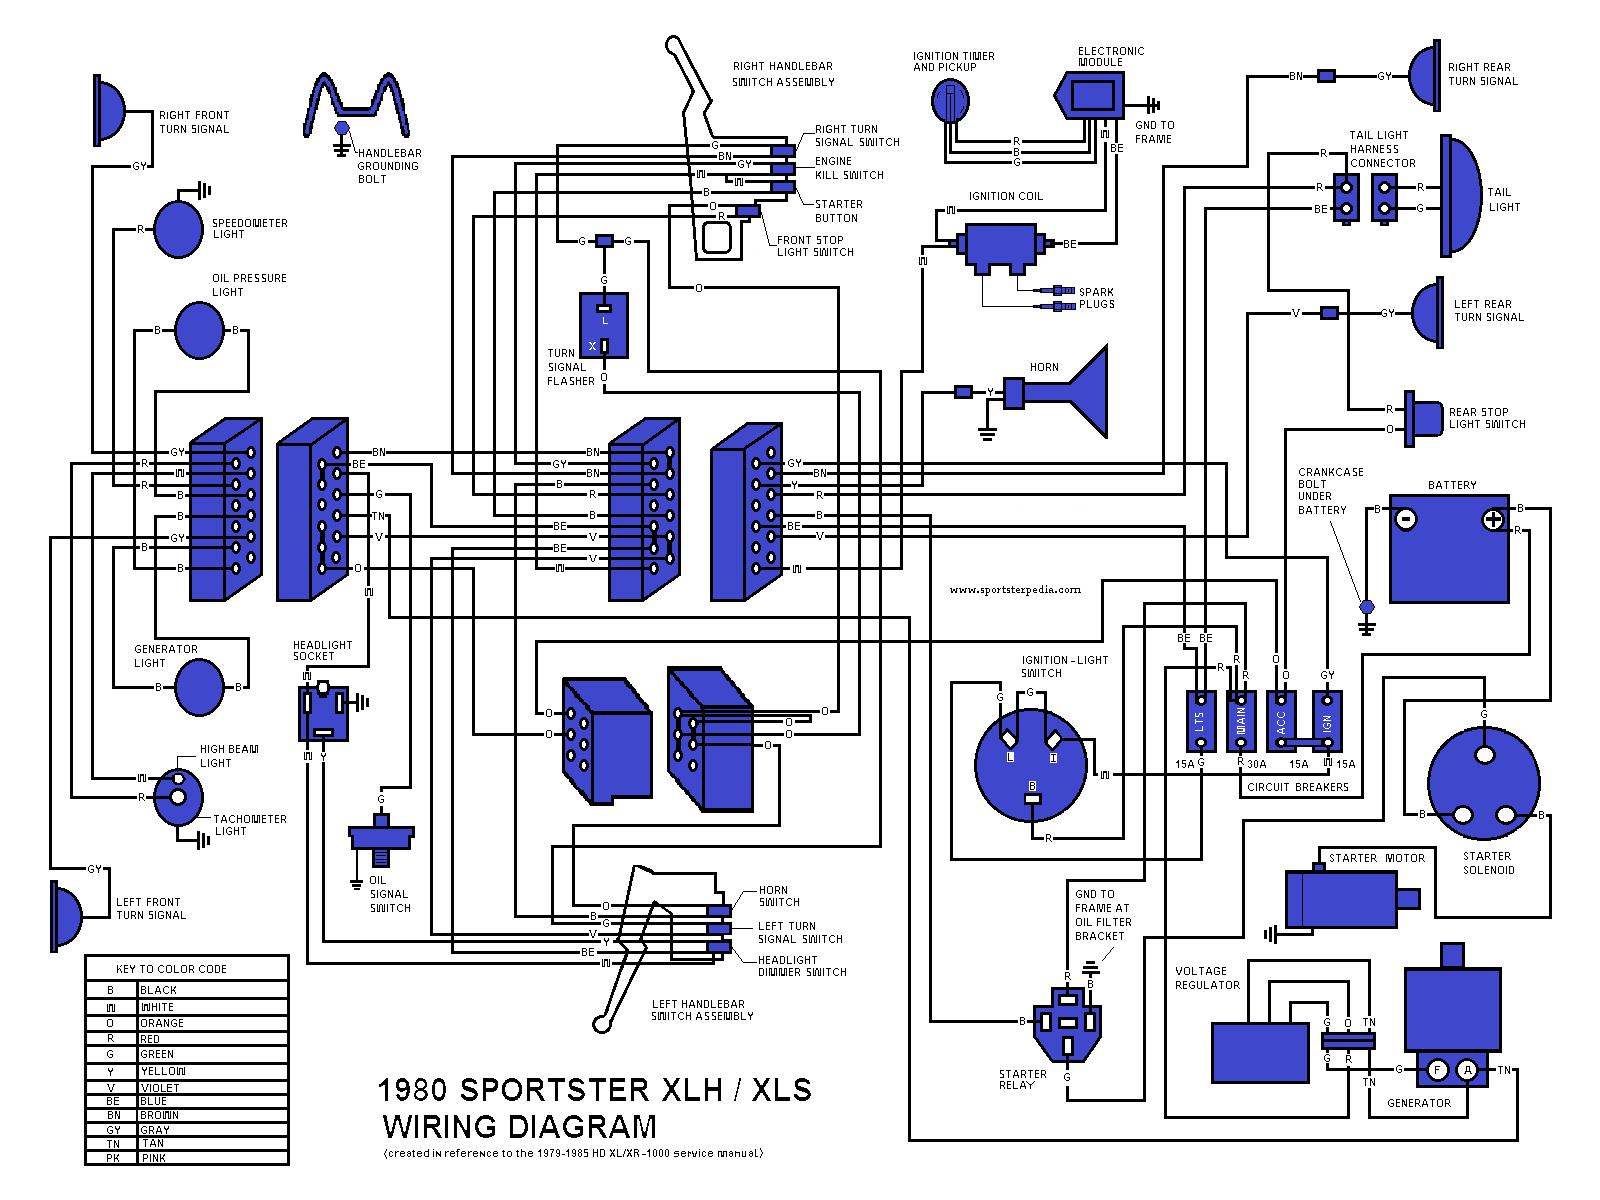 Harley Davidson 1977 Sportster Wiring Diagram Wiring Diagrams Collection Collection Chatteriedelavalleedufelin Fr